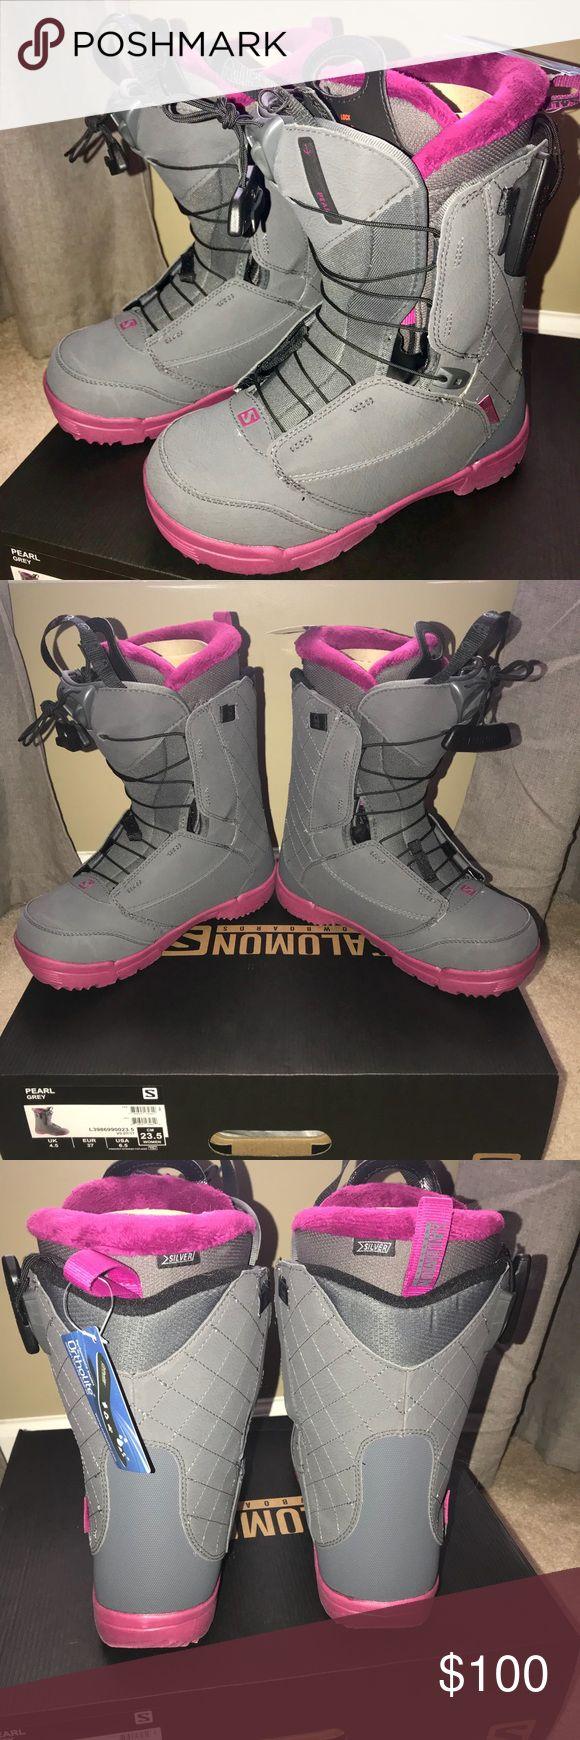 Women's 2018 Pearl Grey sz 6 snowboard boots. Brand new with tags and box Women's 2018 Pearl Grey Salomon snowboard boots. Size 6 never used! Salomon Other